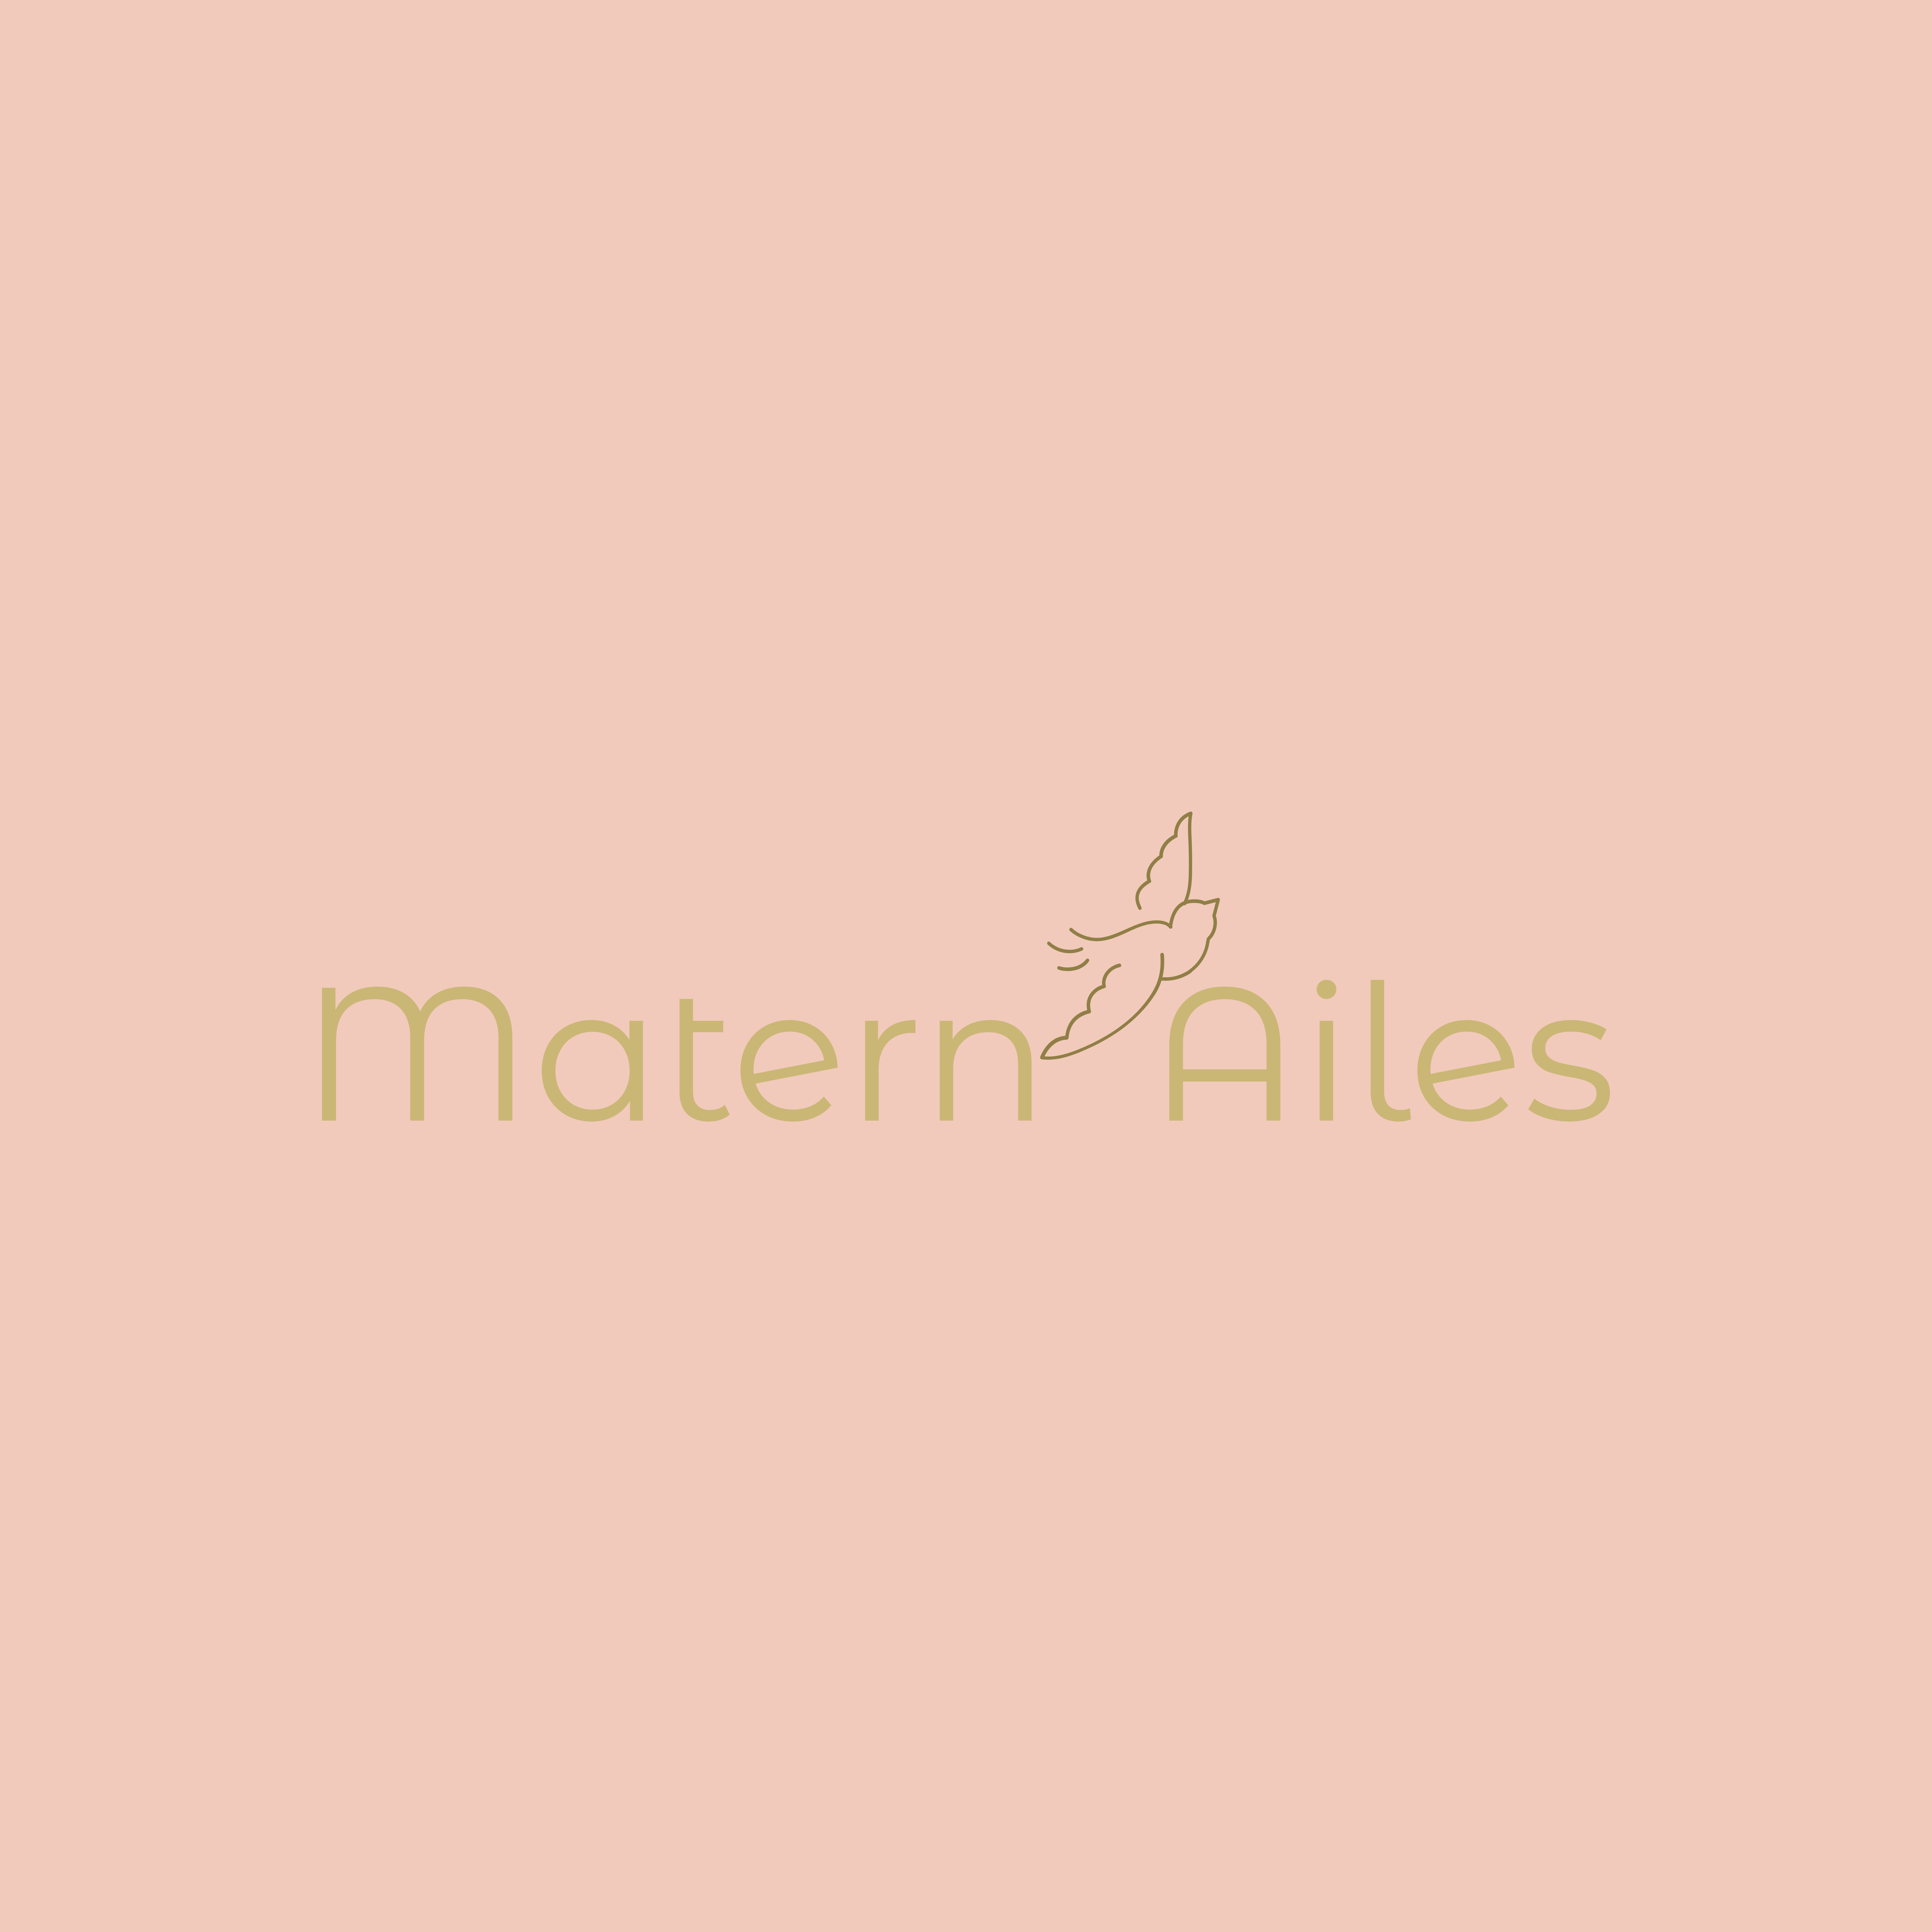 Matern'ailes